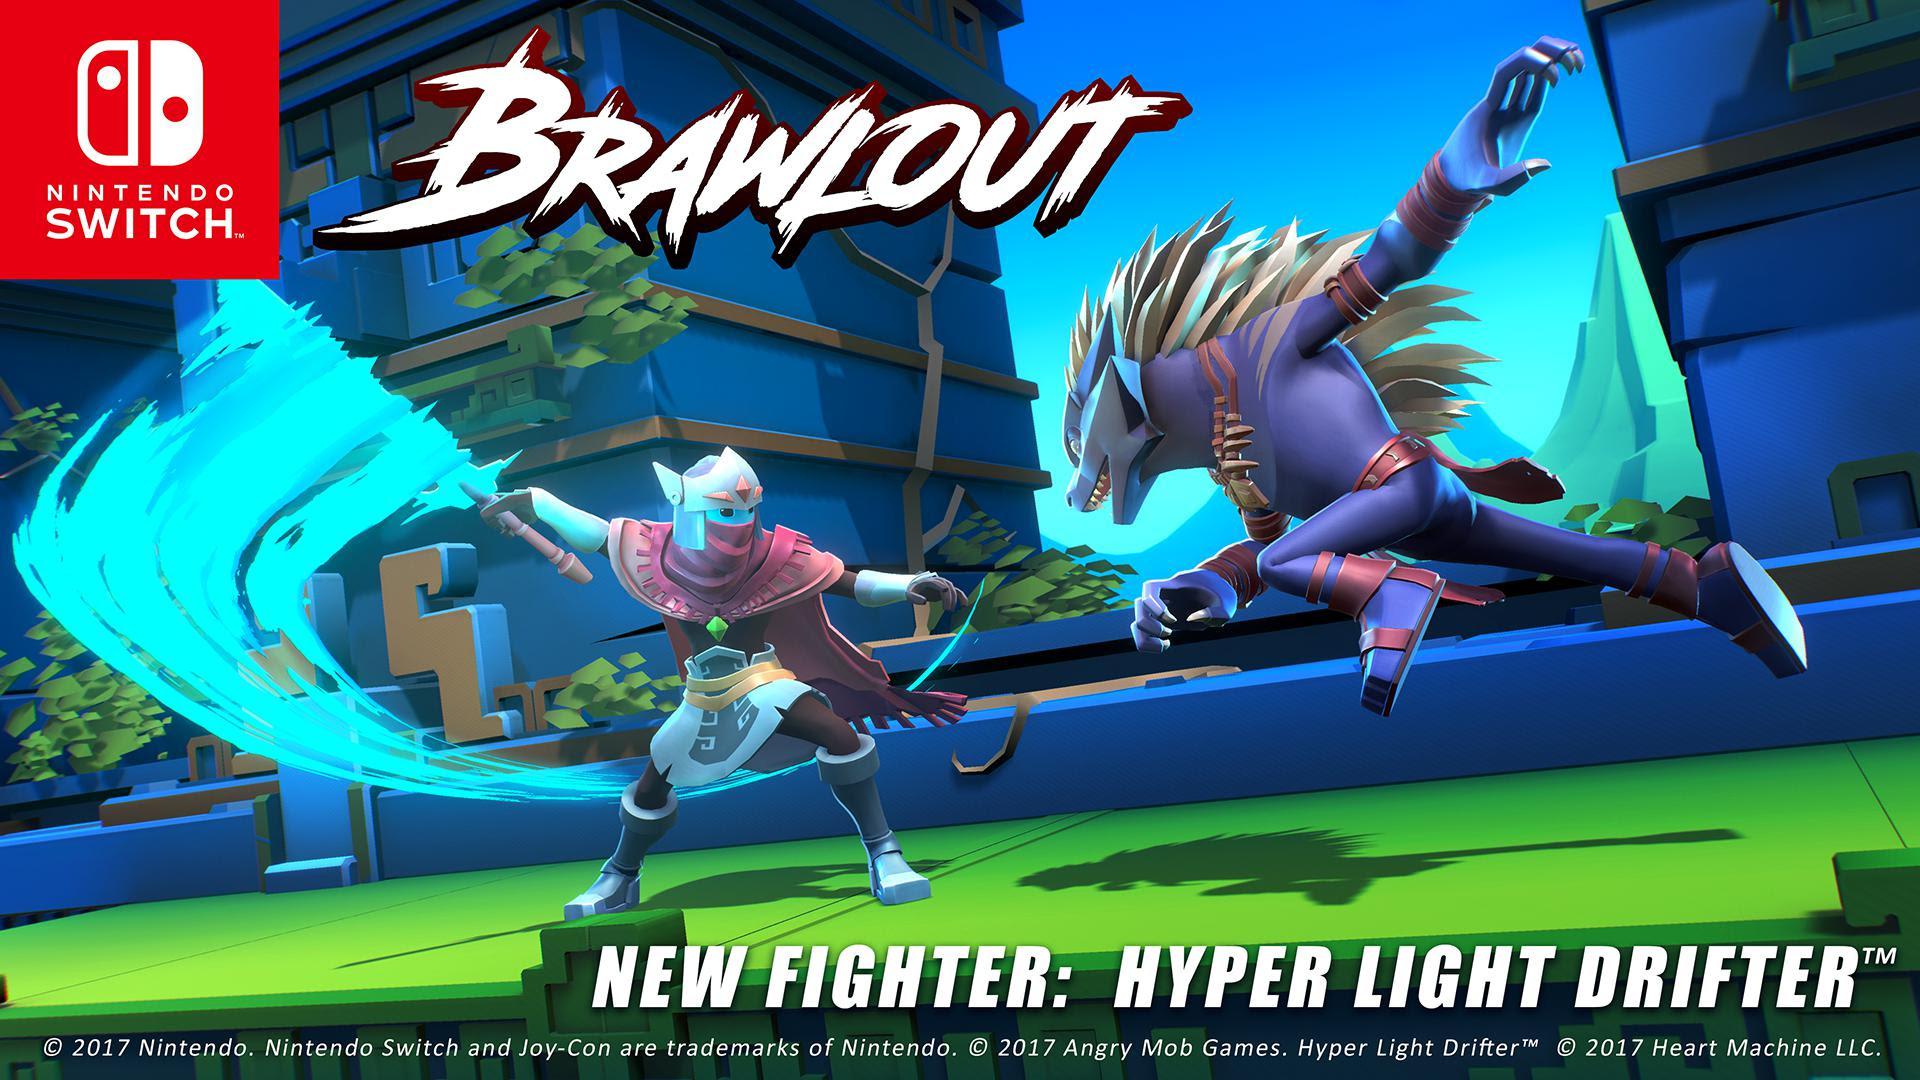 Brawlout saldrá en Switch y presenta un personaje famoso